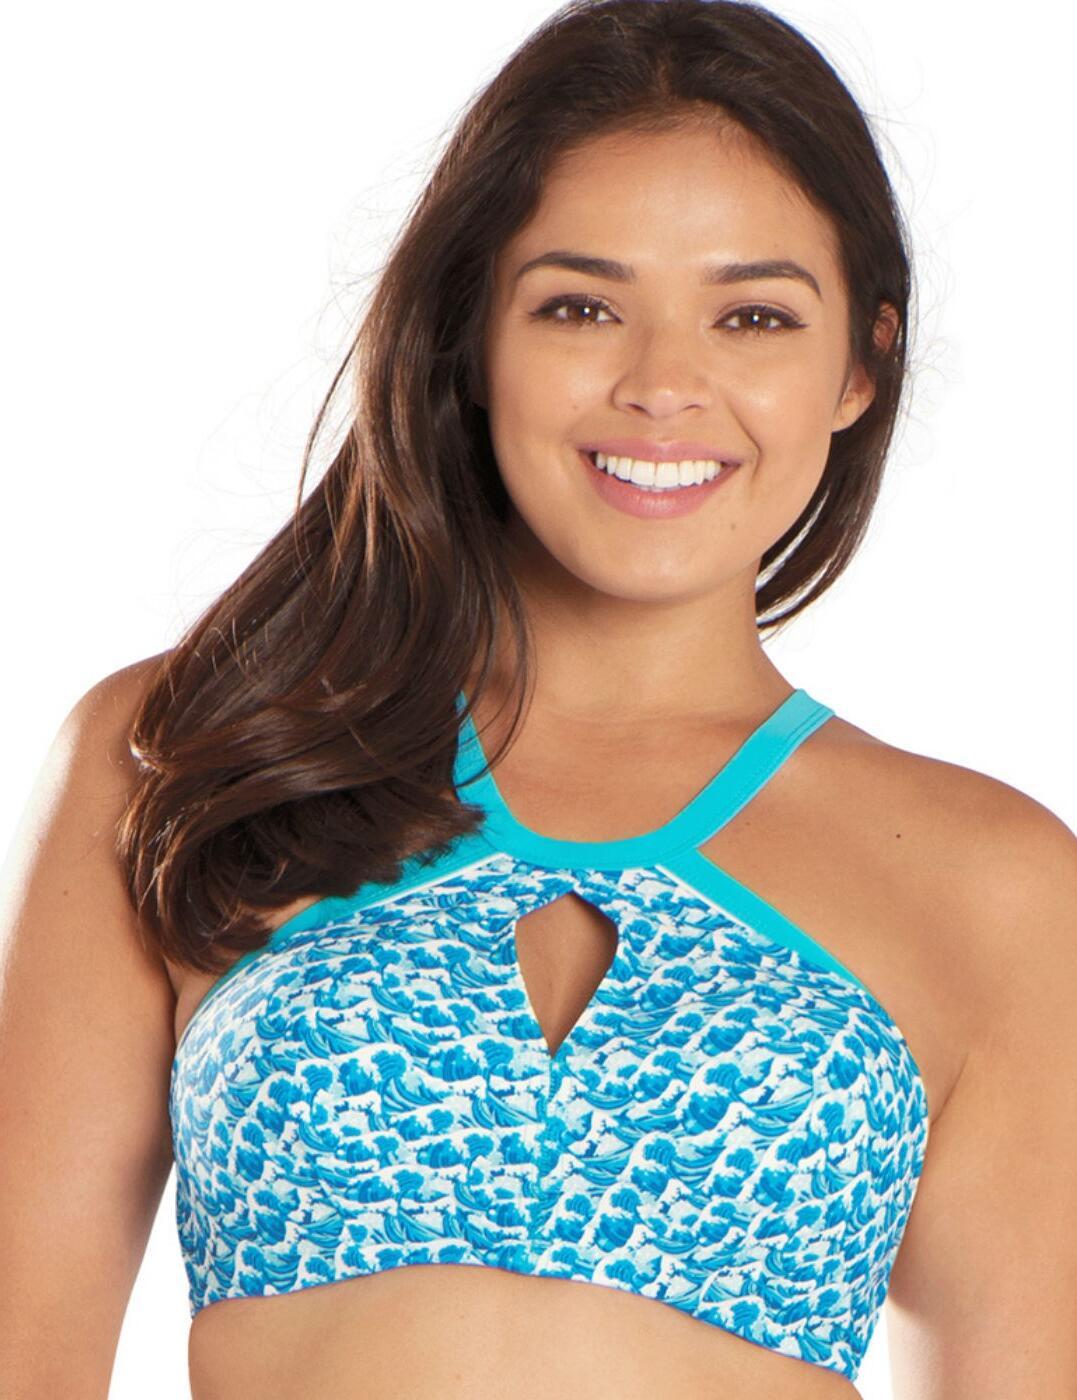 CS4851 Curvy Kate Riptide Plunge Bikini Top Blue Print - CS4851 Plunge Bikini Top